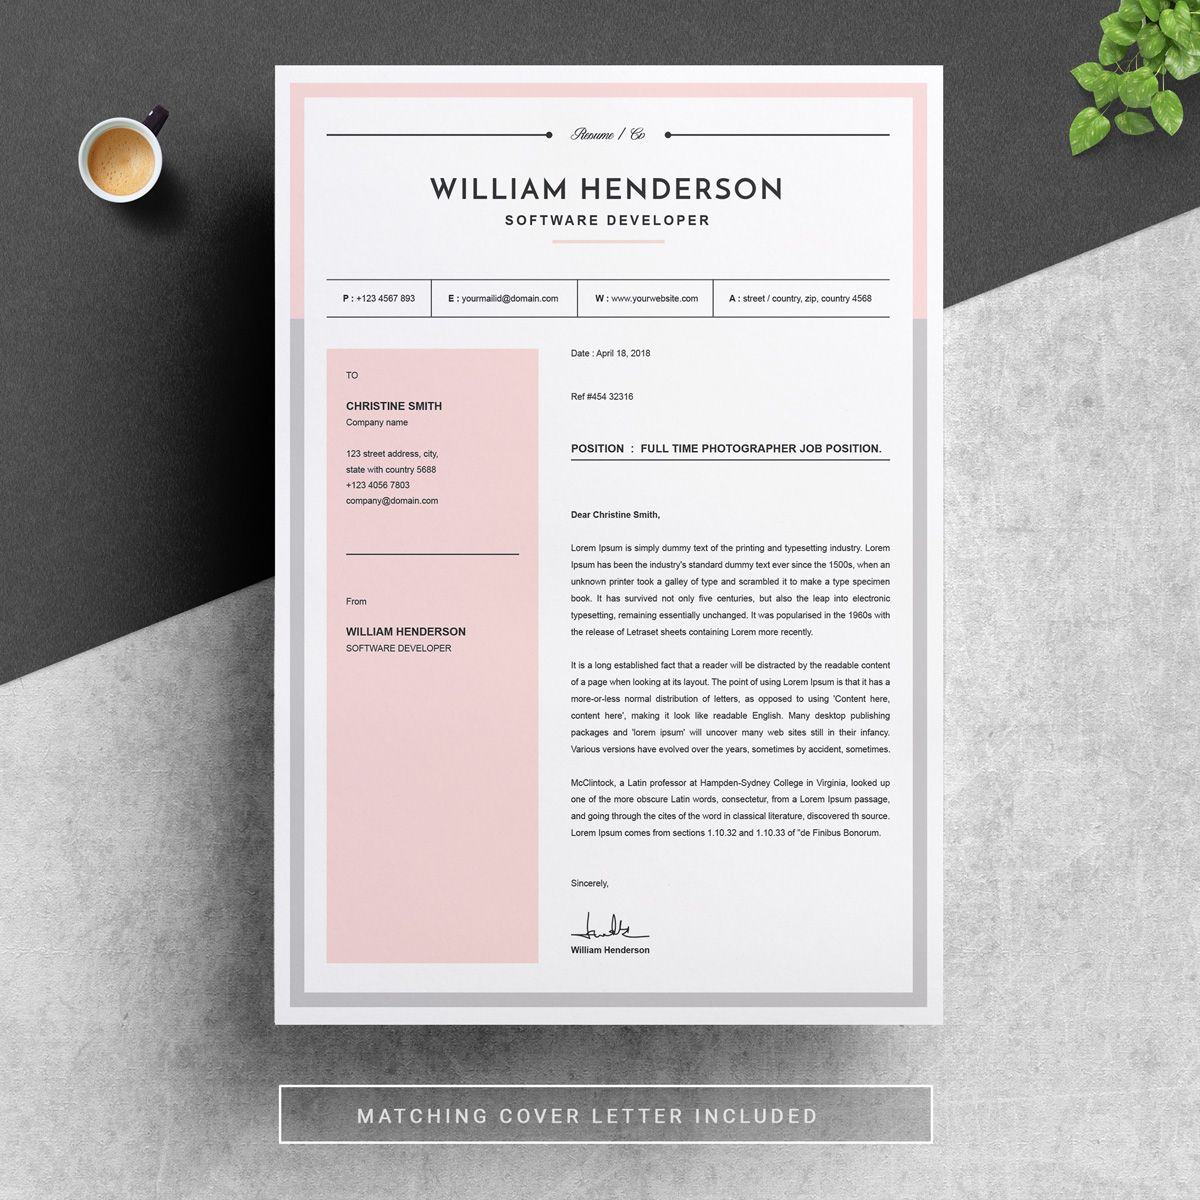 William Resume Template 79019 Modern resume, Resume